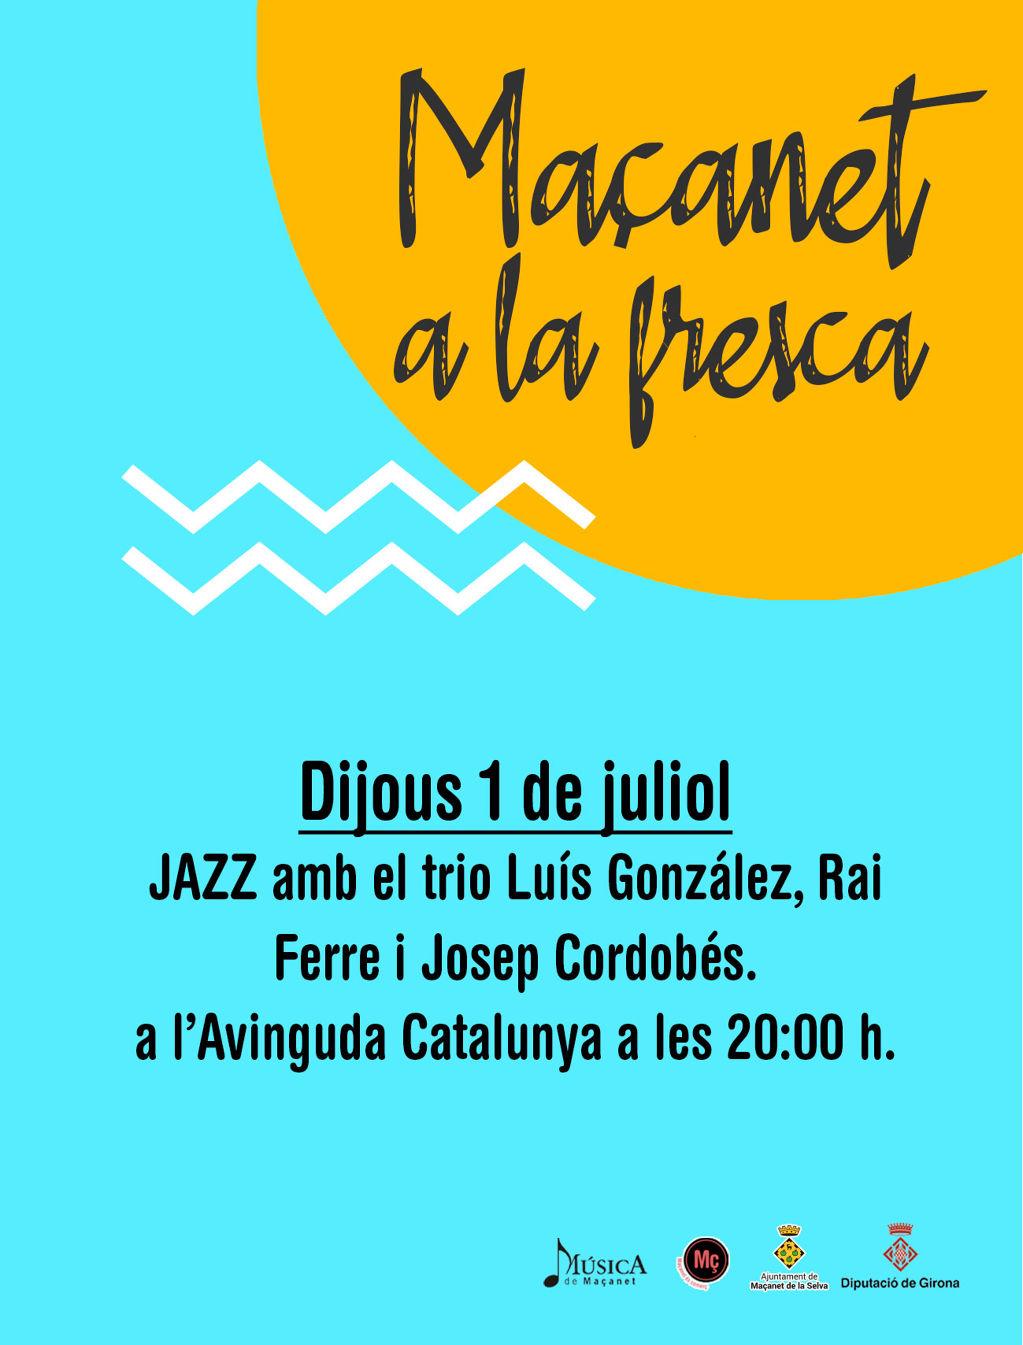 MAÇANET A LA FRESCA: Jazz - c981d-1-juliol.jpg